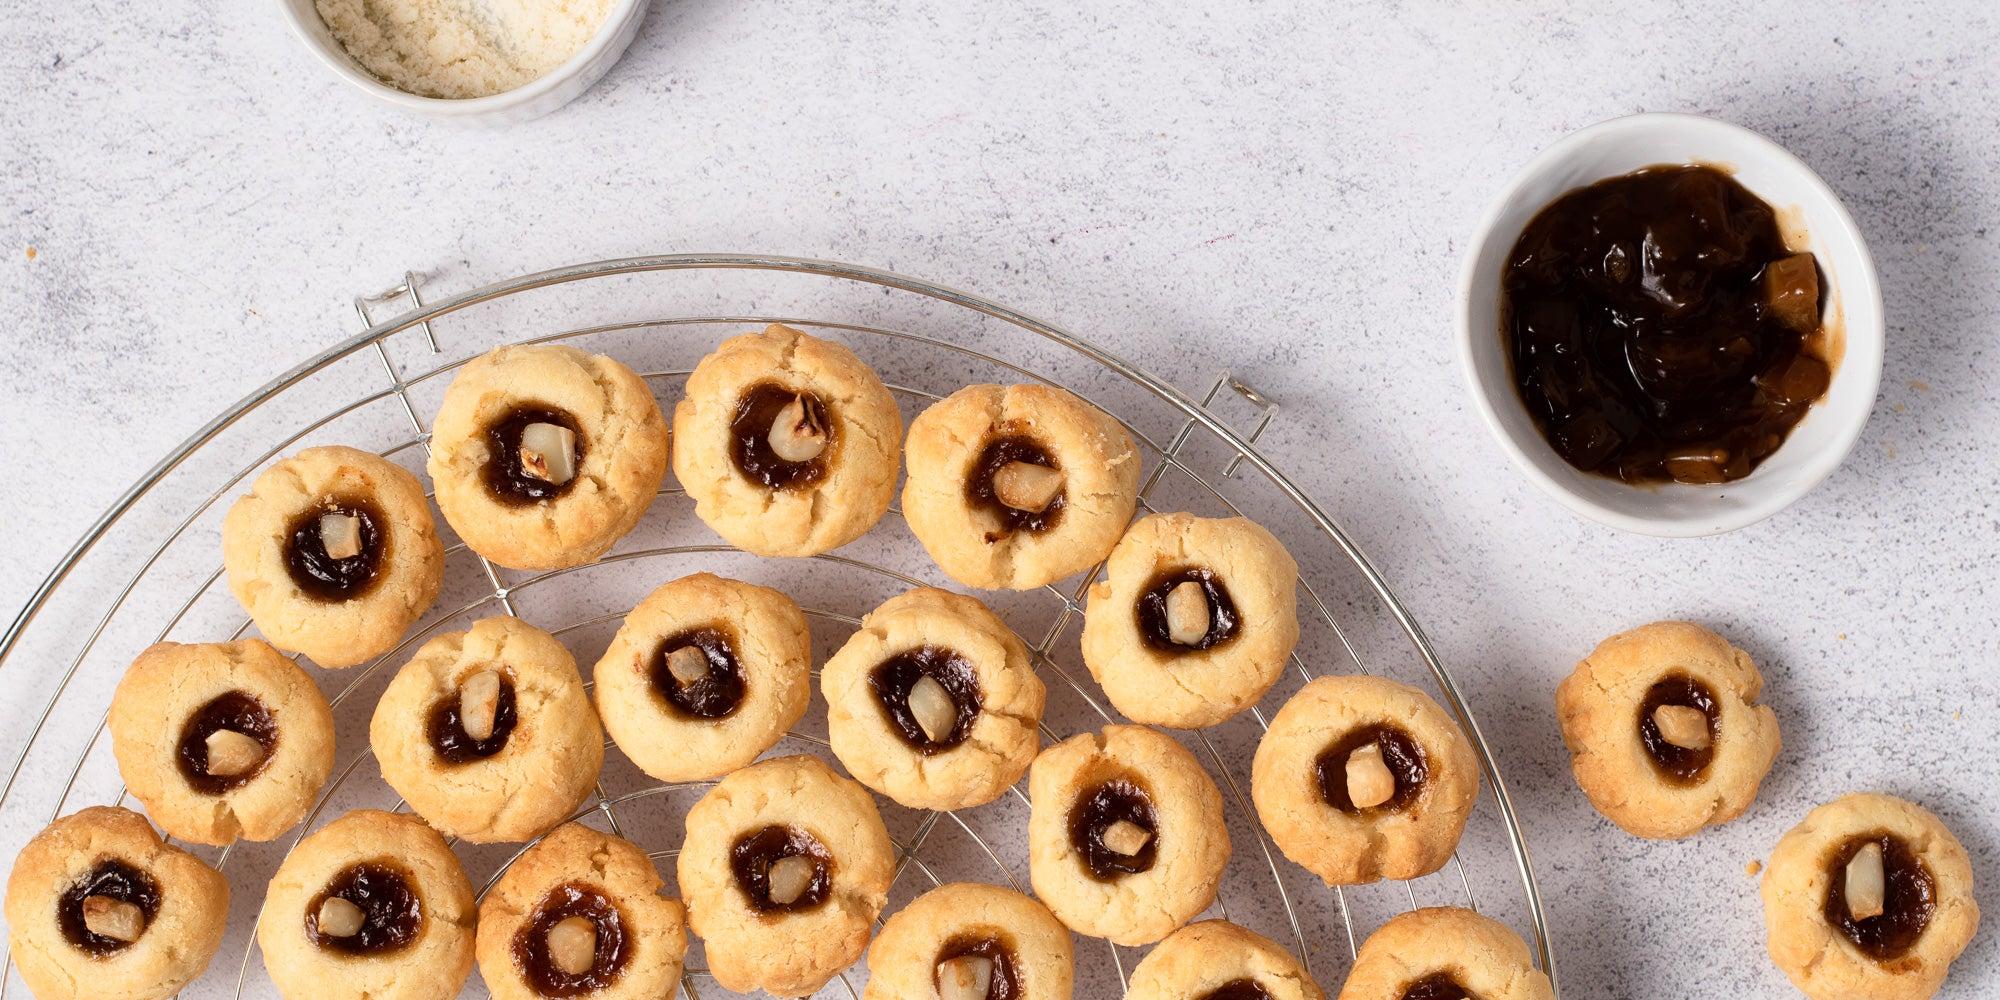 Savoury Parmesan Thumbprint Biscuits